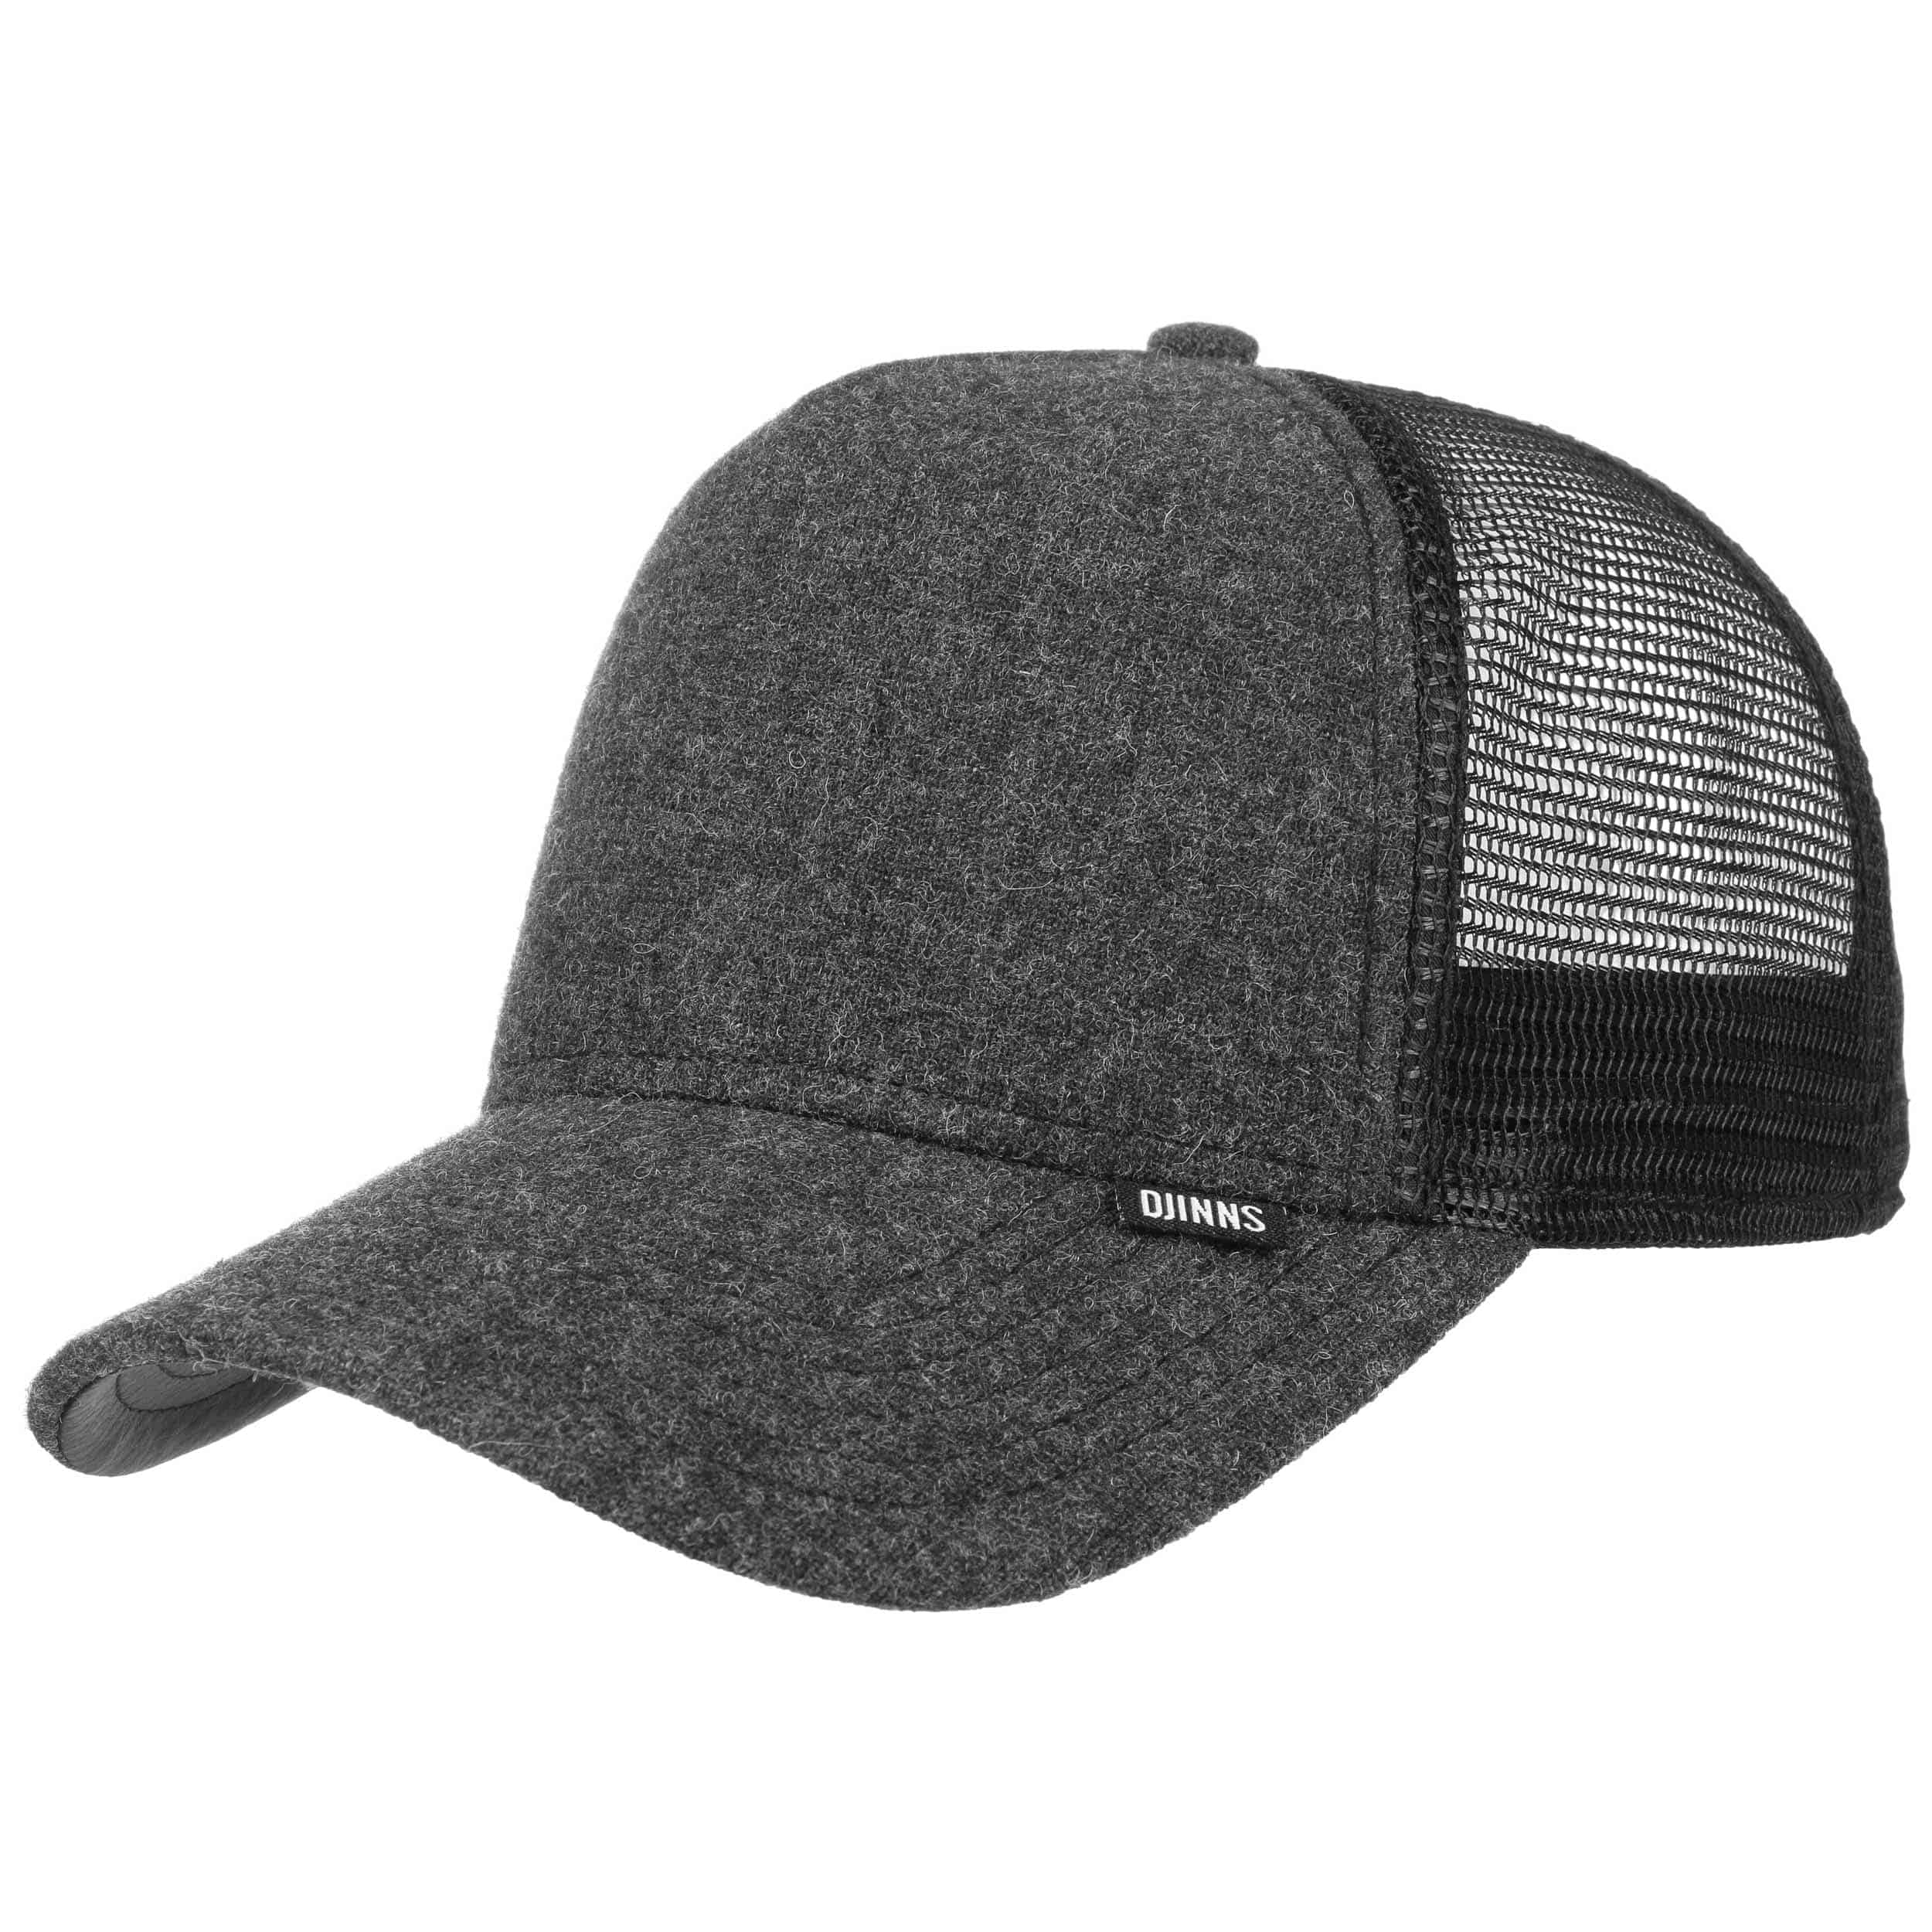 flannel trucker cap by djinns gbp 22 95 hats caps. Black Bedroom Furniture Sets. Home Design Ideas